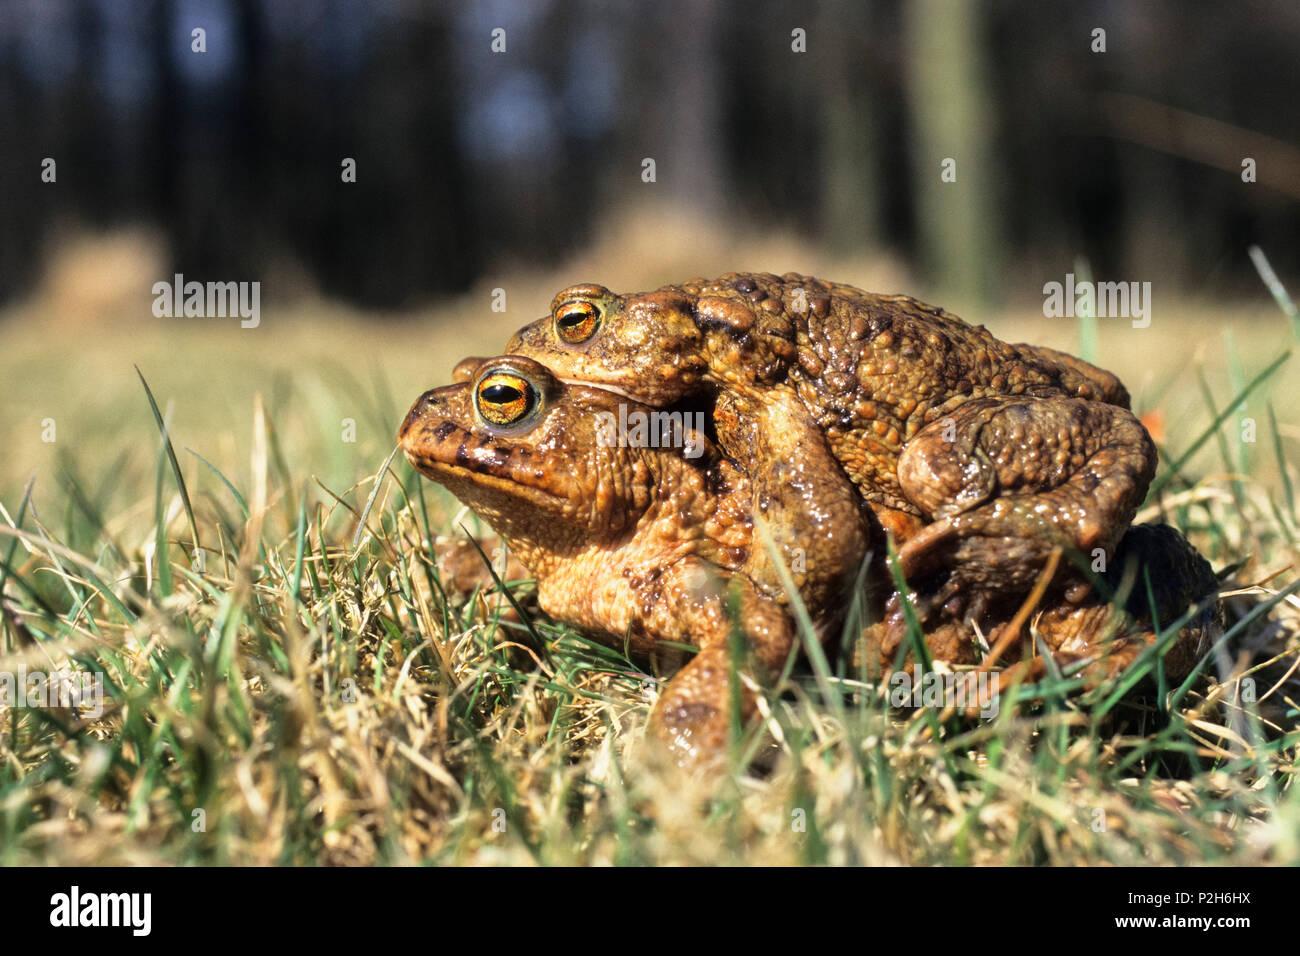 Toads mating, Bufo bufo, Bavaria, Germany - Stock Image